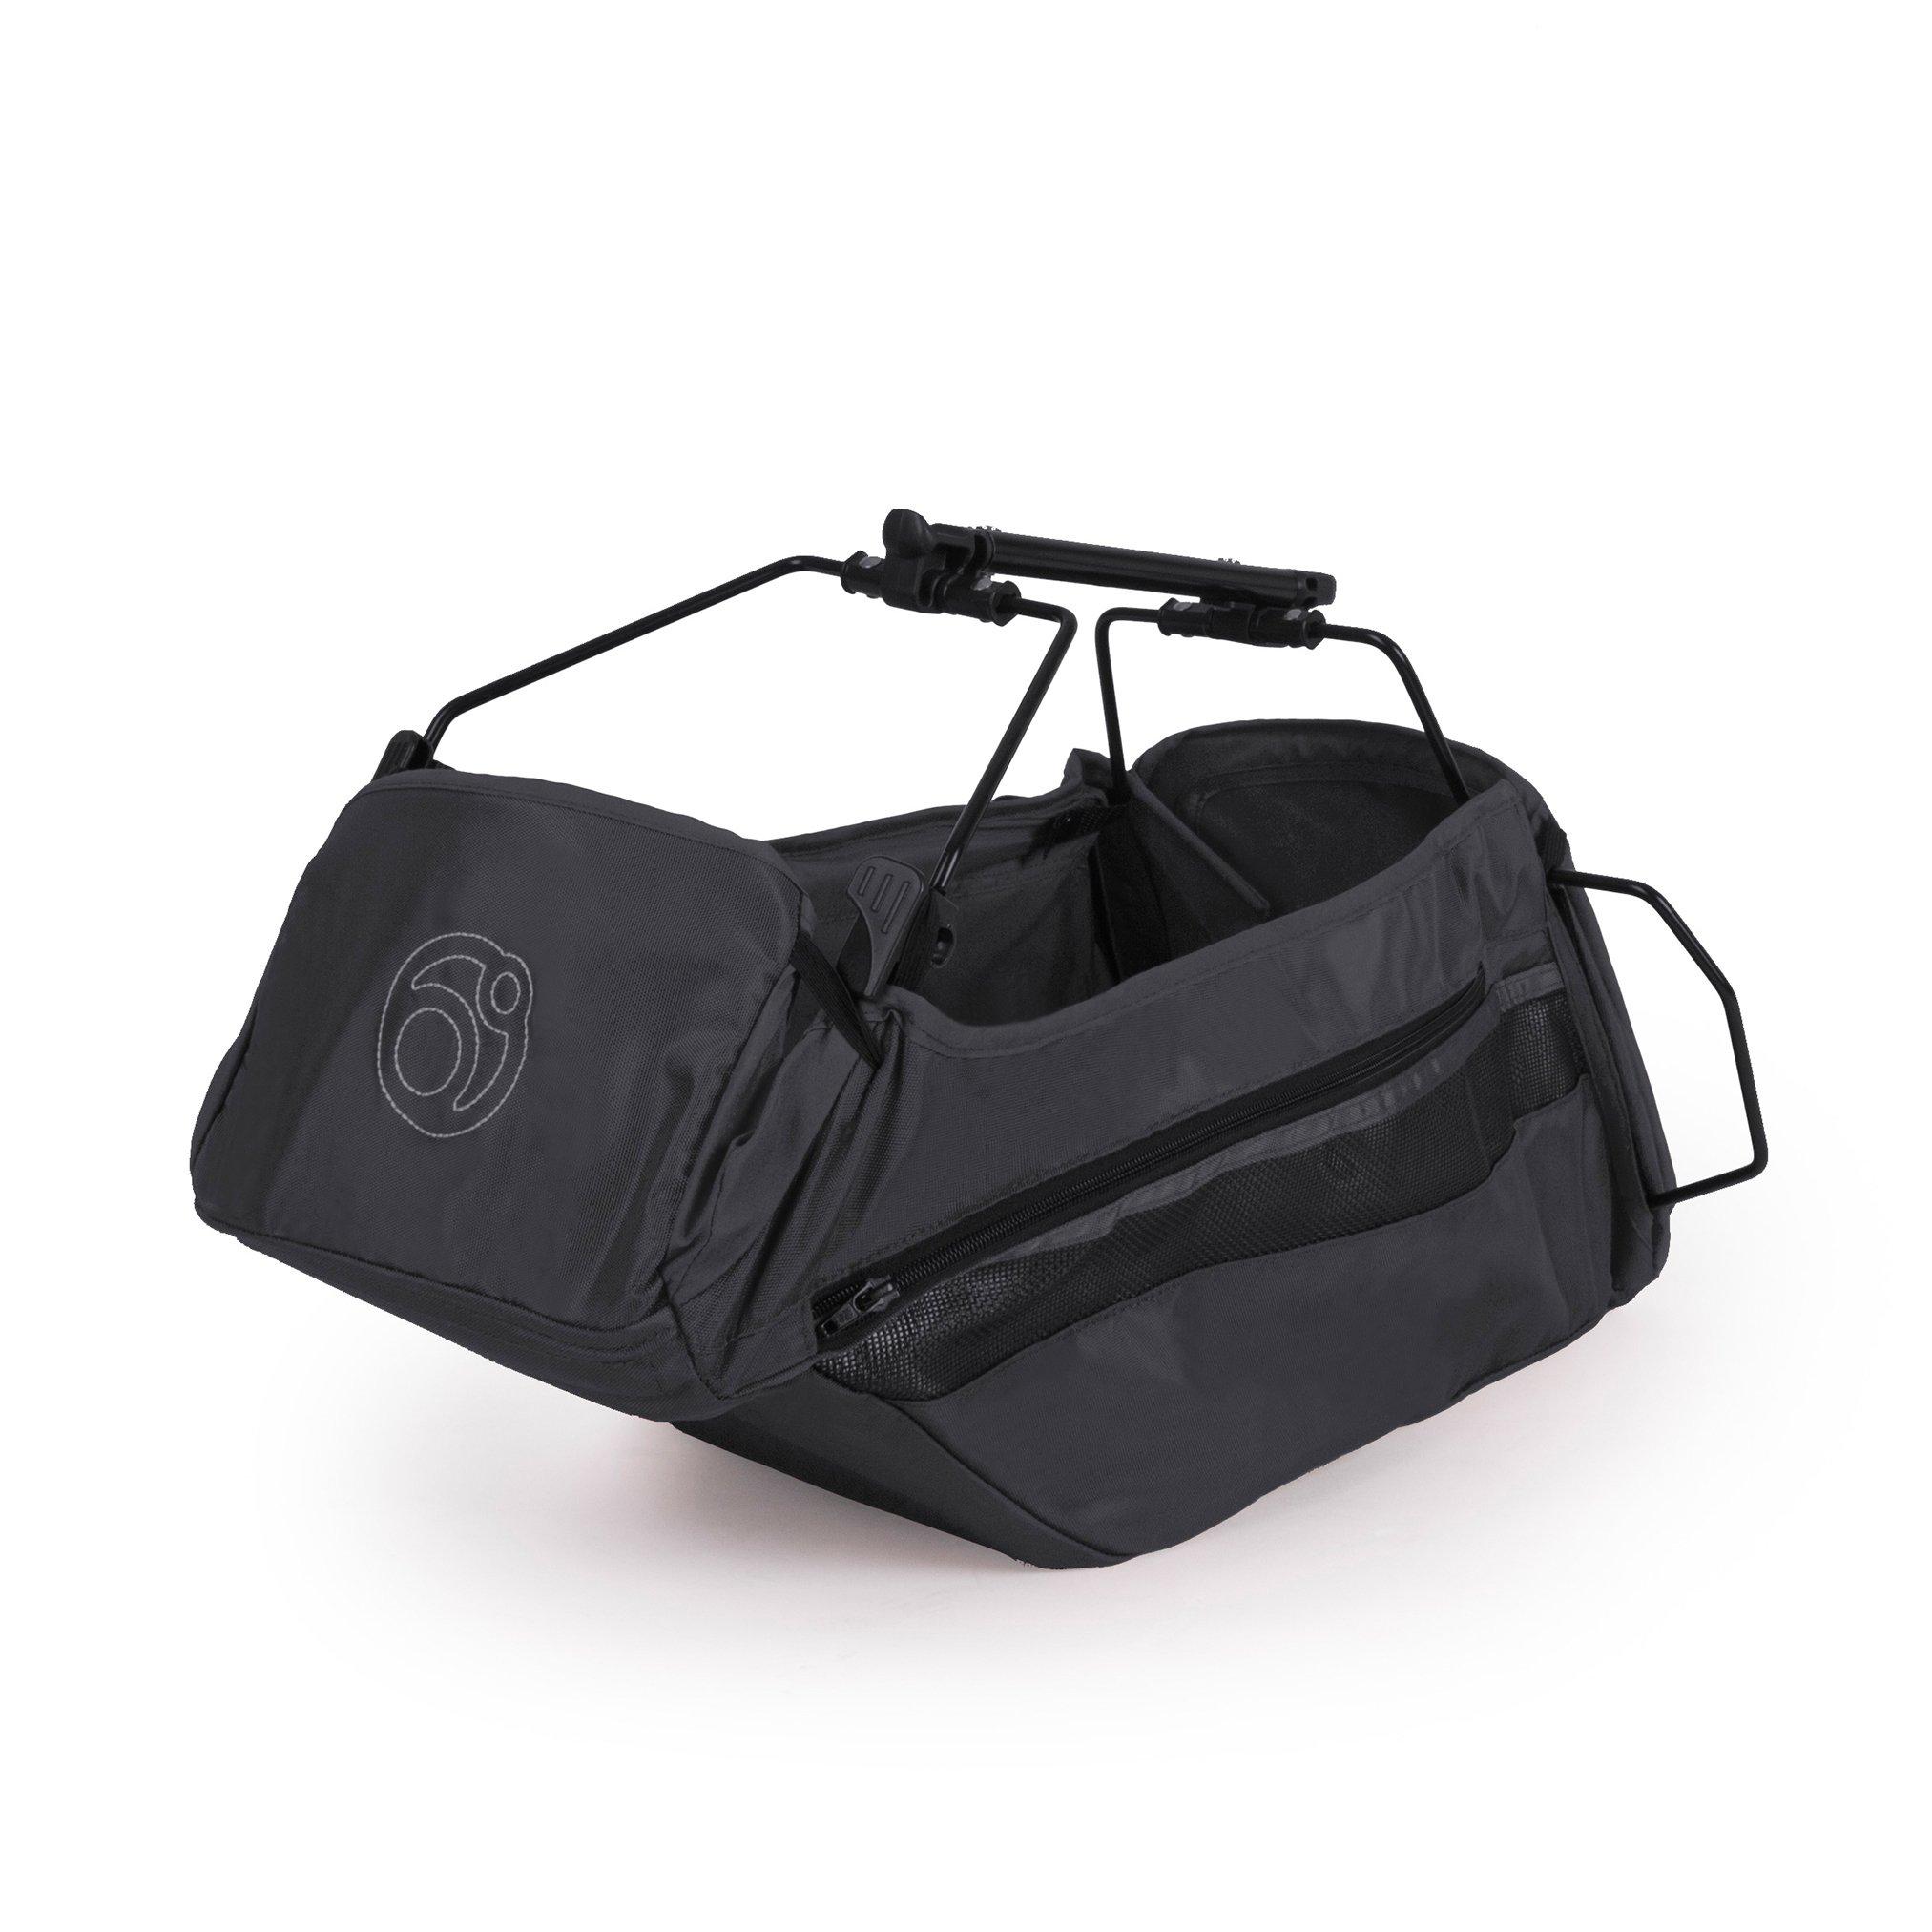 Orbit Baby G3 Stroller Cargo Basket, Black